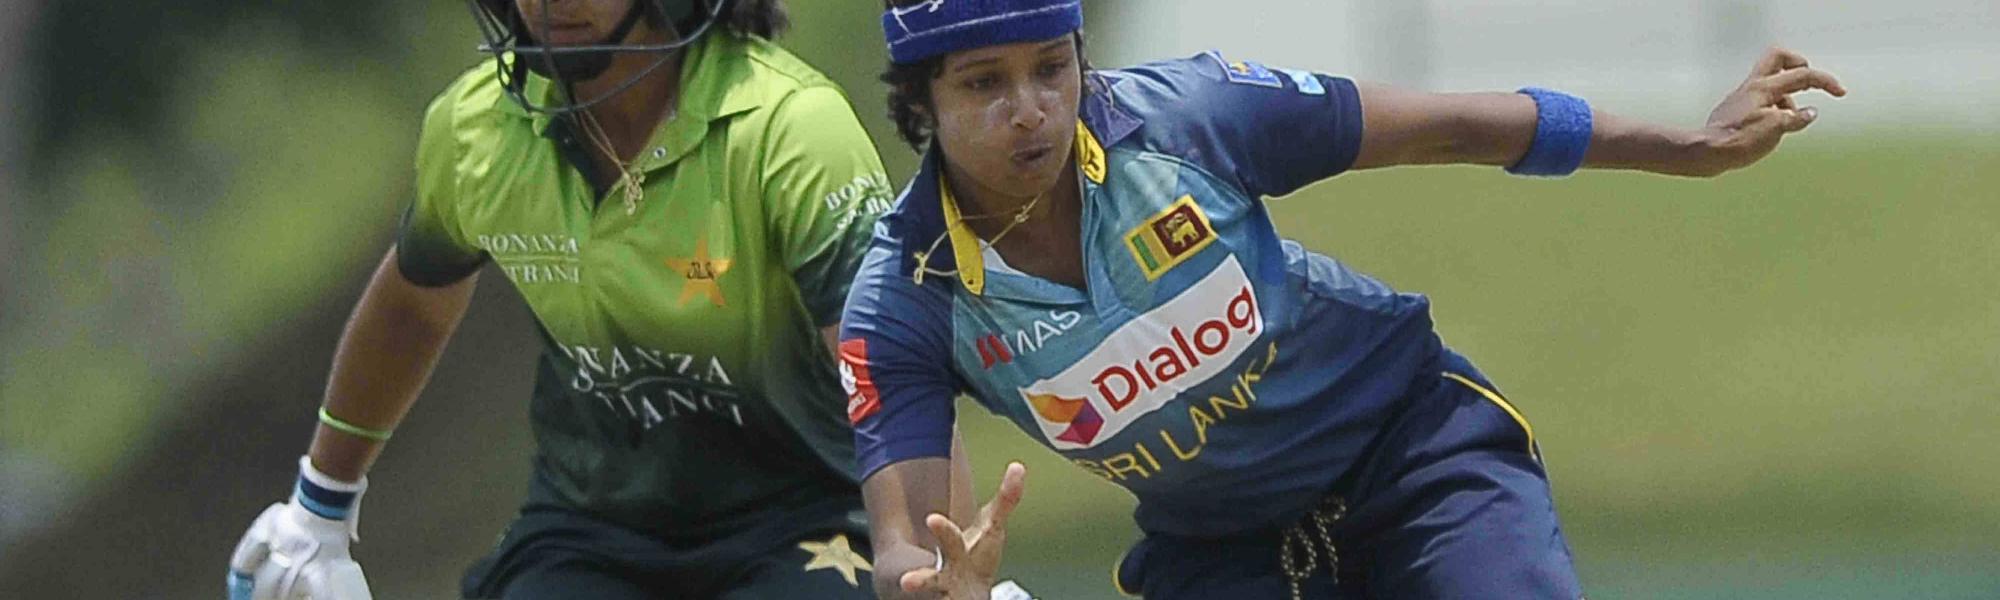 SL v Pak - lead image